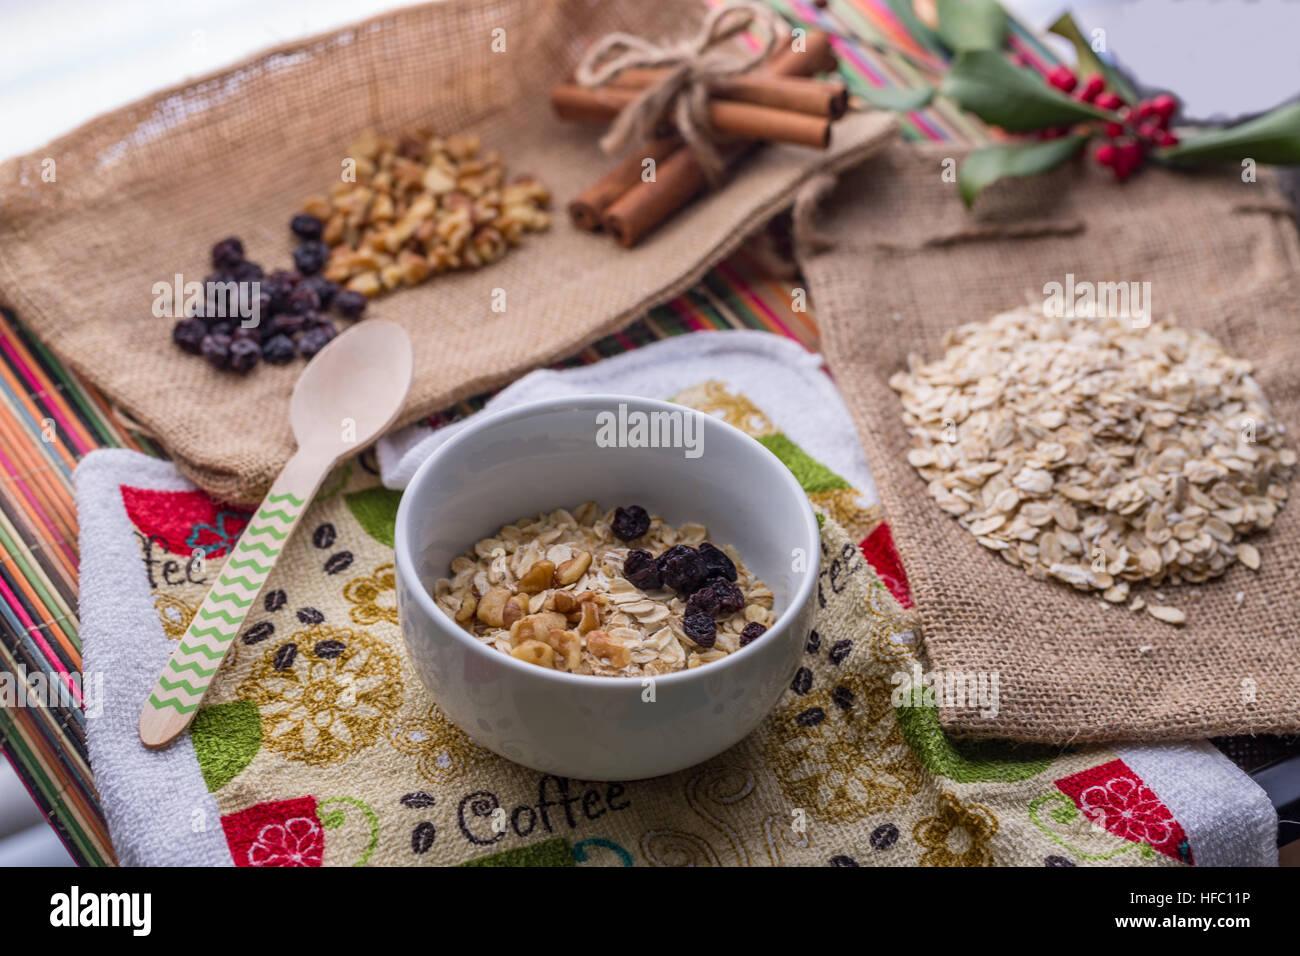 Oatmeal breakfast with walnut, raisin, and cinnamon in milk. - Stock Image